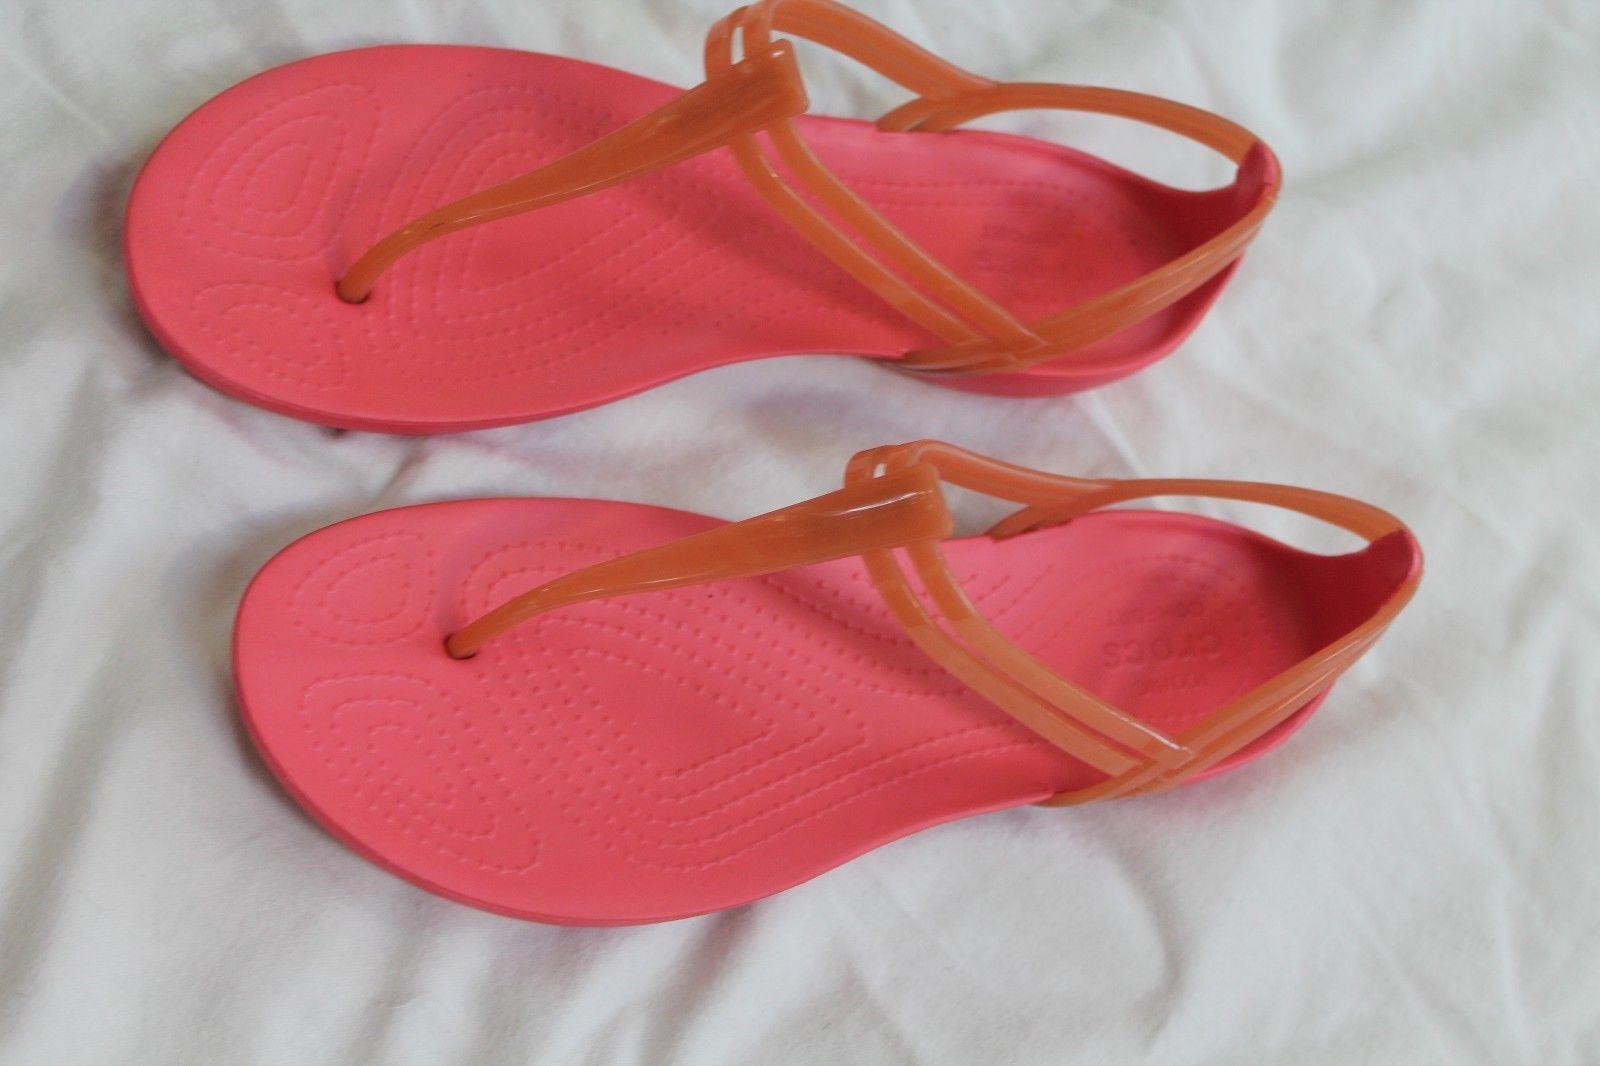 c662abb55692 Crocs Women s Isabella T-Strap Sandals Pink and 50 similar items